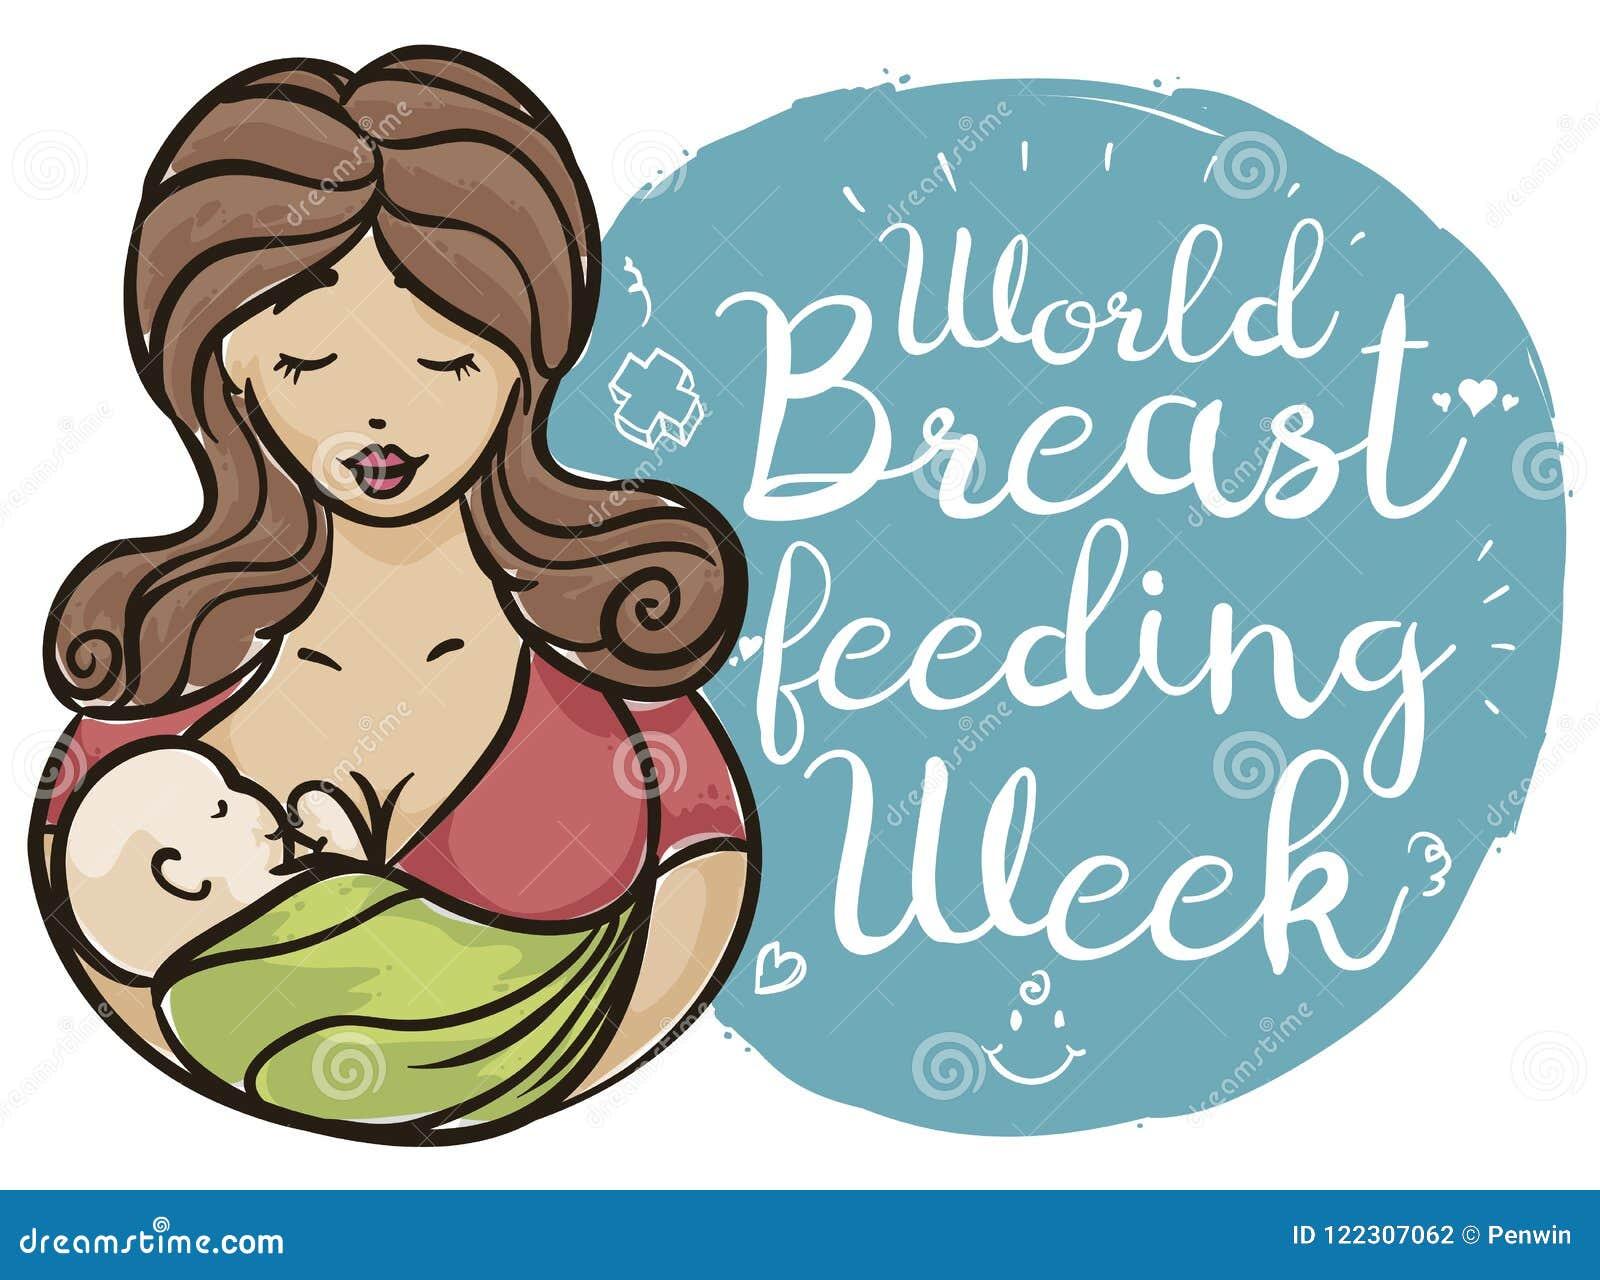 Mother Carrying her Baby in Brush Stroke Style, Celebrating Breastfeeding Week, Vector Illustration